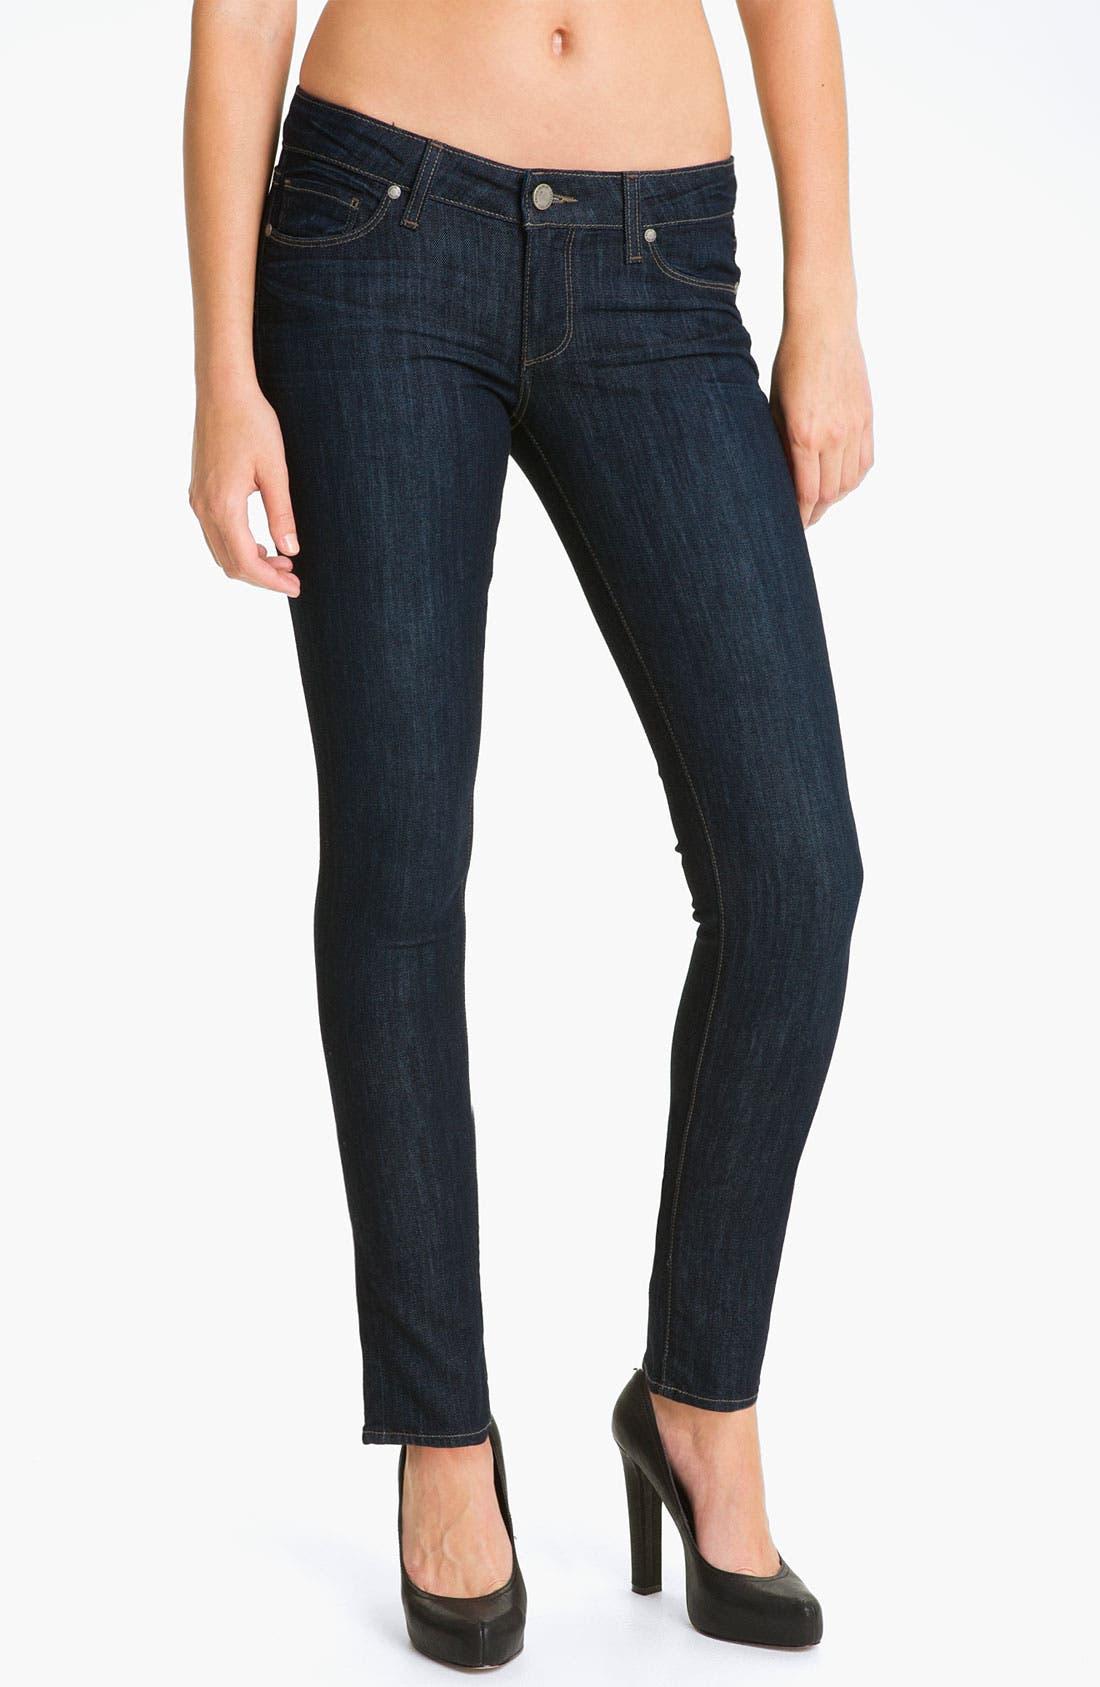 Main Image - Paige Denim 'Skyline' Ankle Peg Skinny Stretch Jeans (Dream)